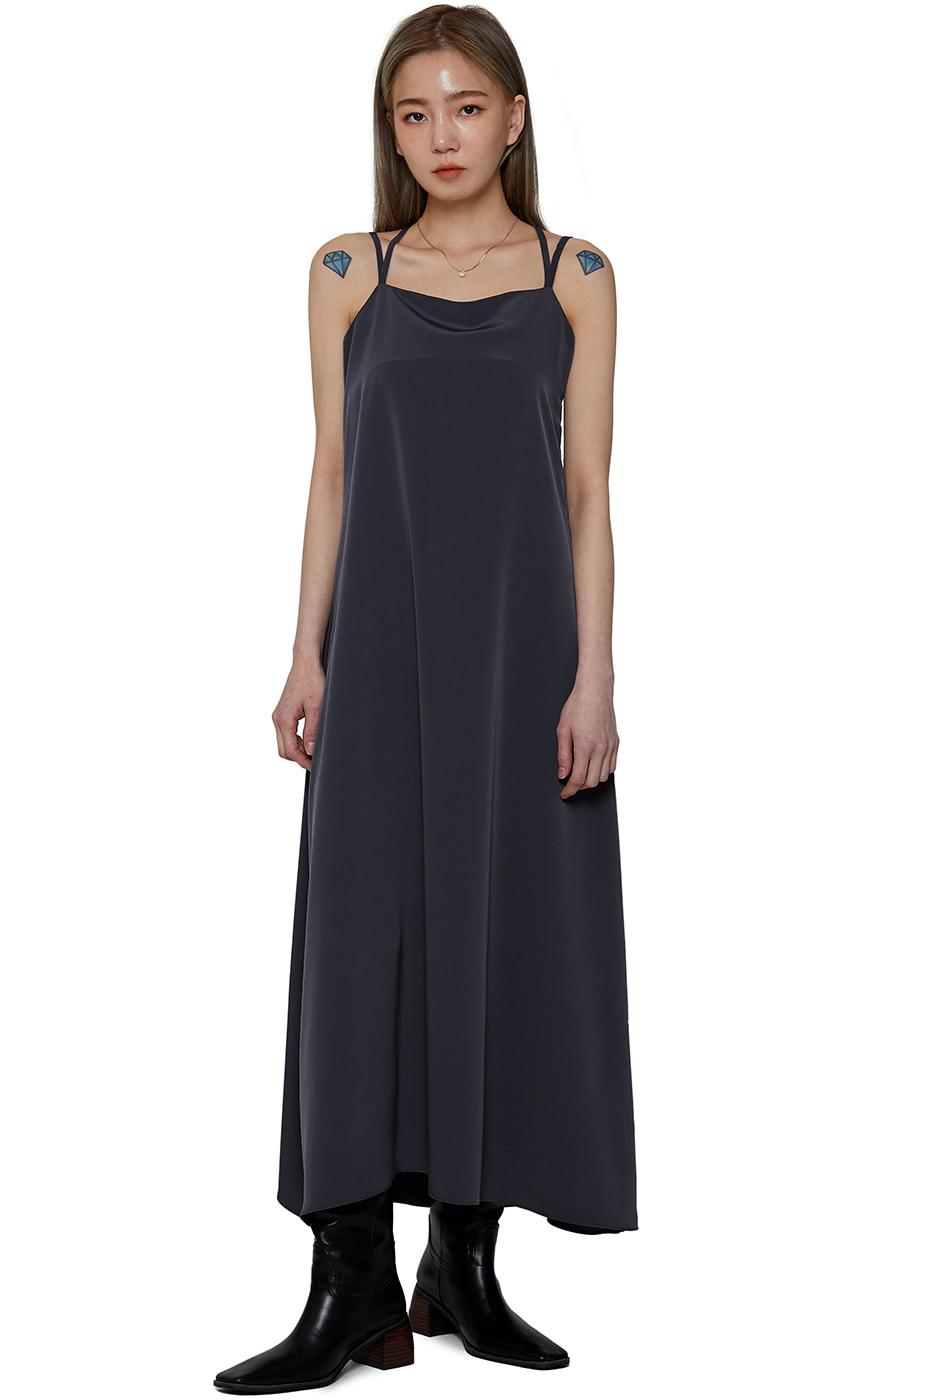 Athena sleeveless long dress